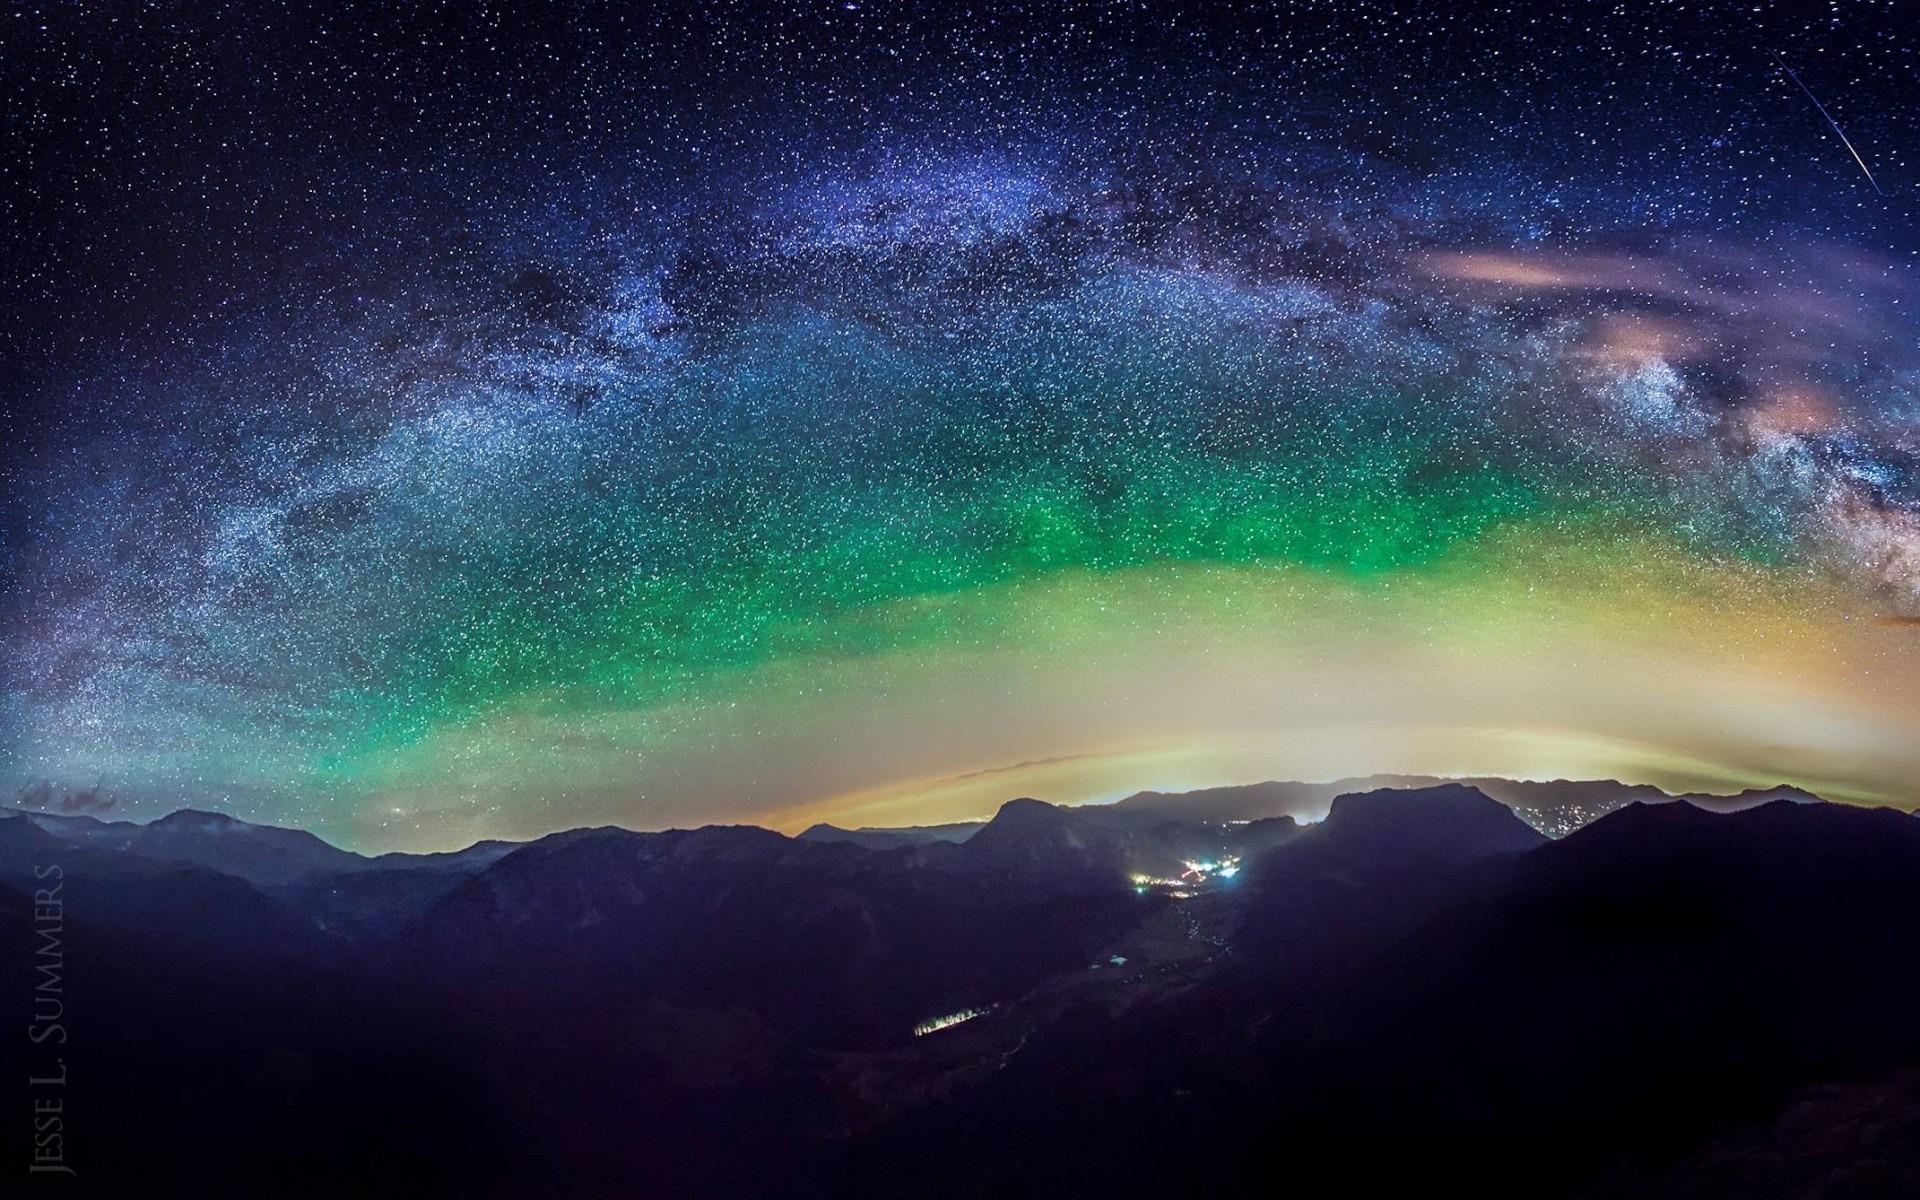 Amazing Milky Way Wallpapers: Amazing Milky Way-design HD Wallpaper Preview